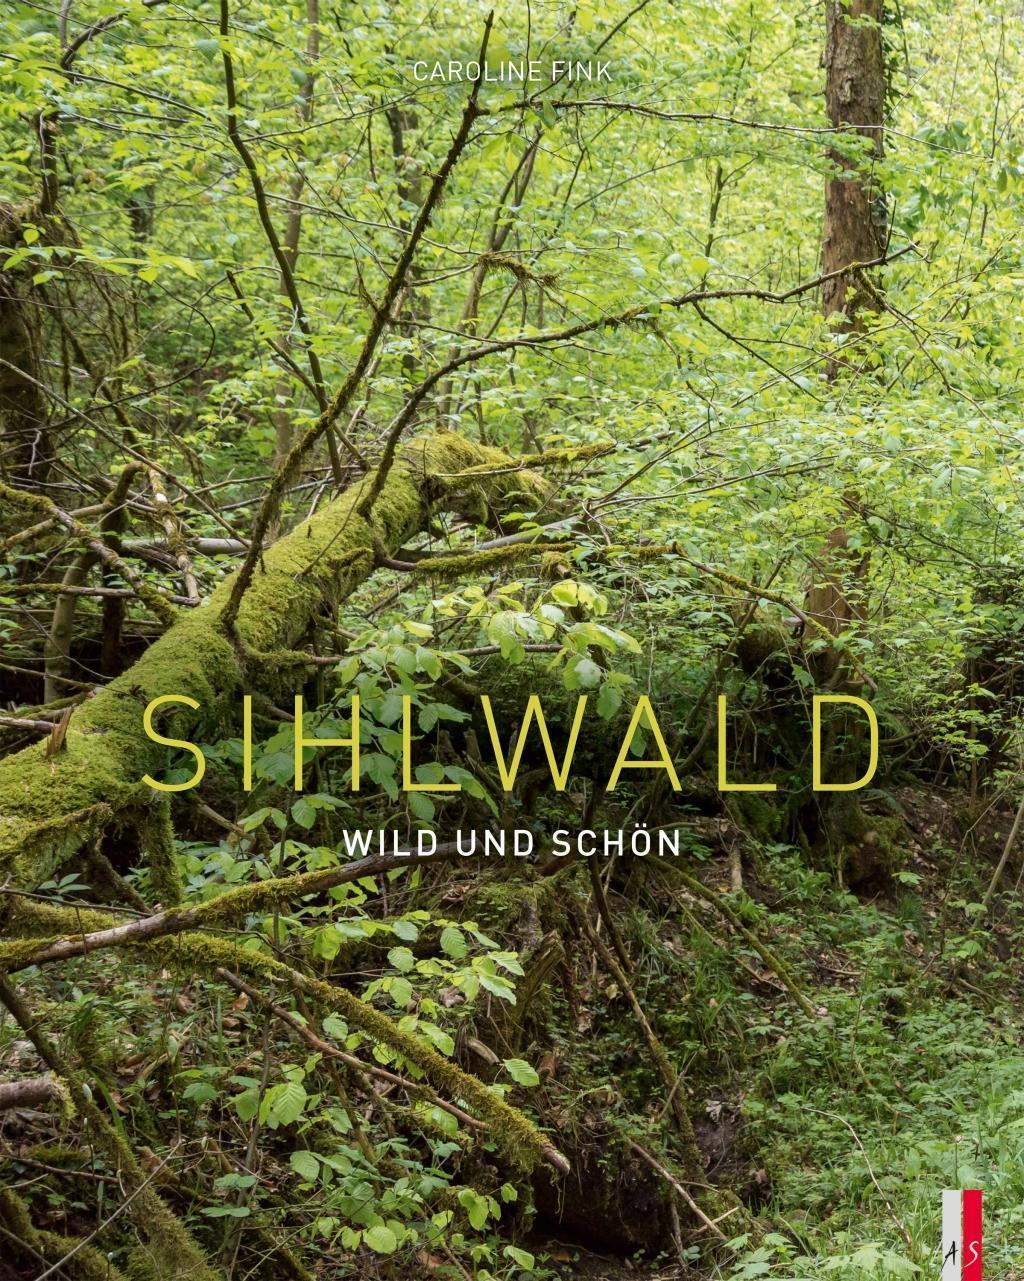 «Sihlwald», Caroline Fink, Zürich 2020, Signatur: 2020 D 10964